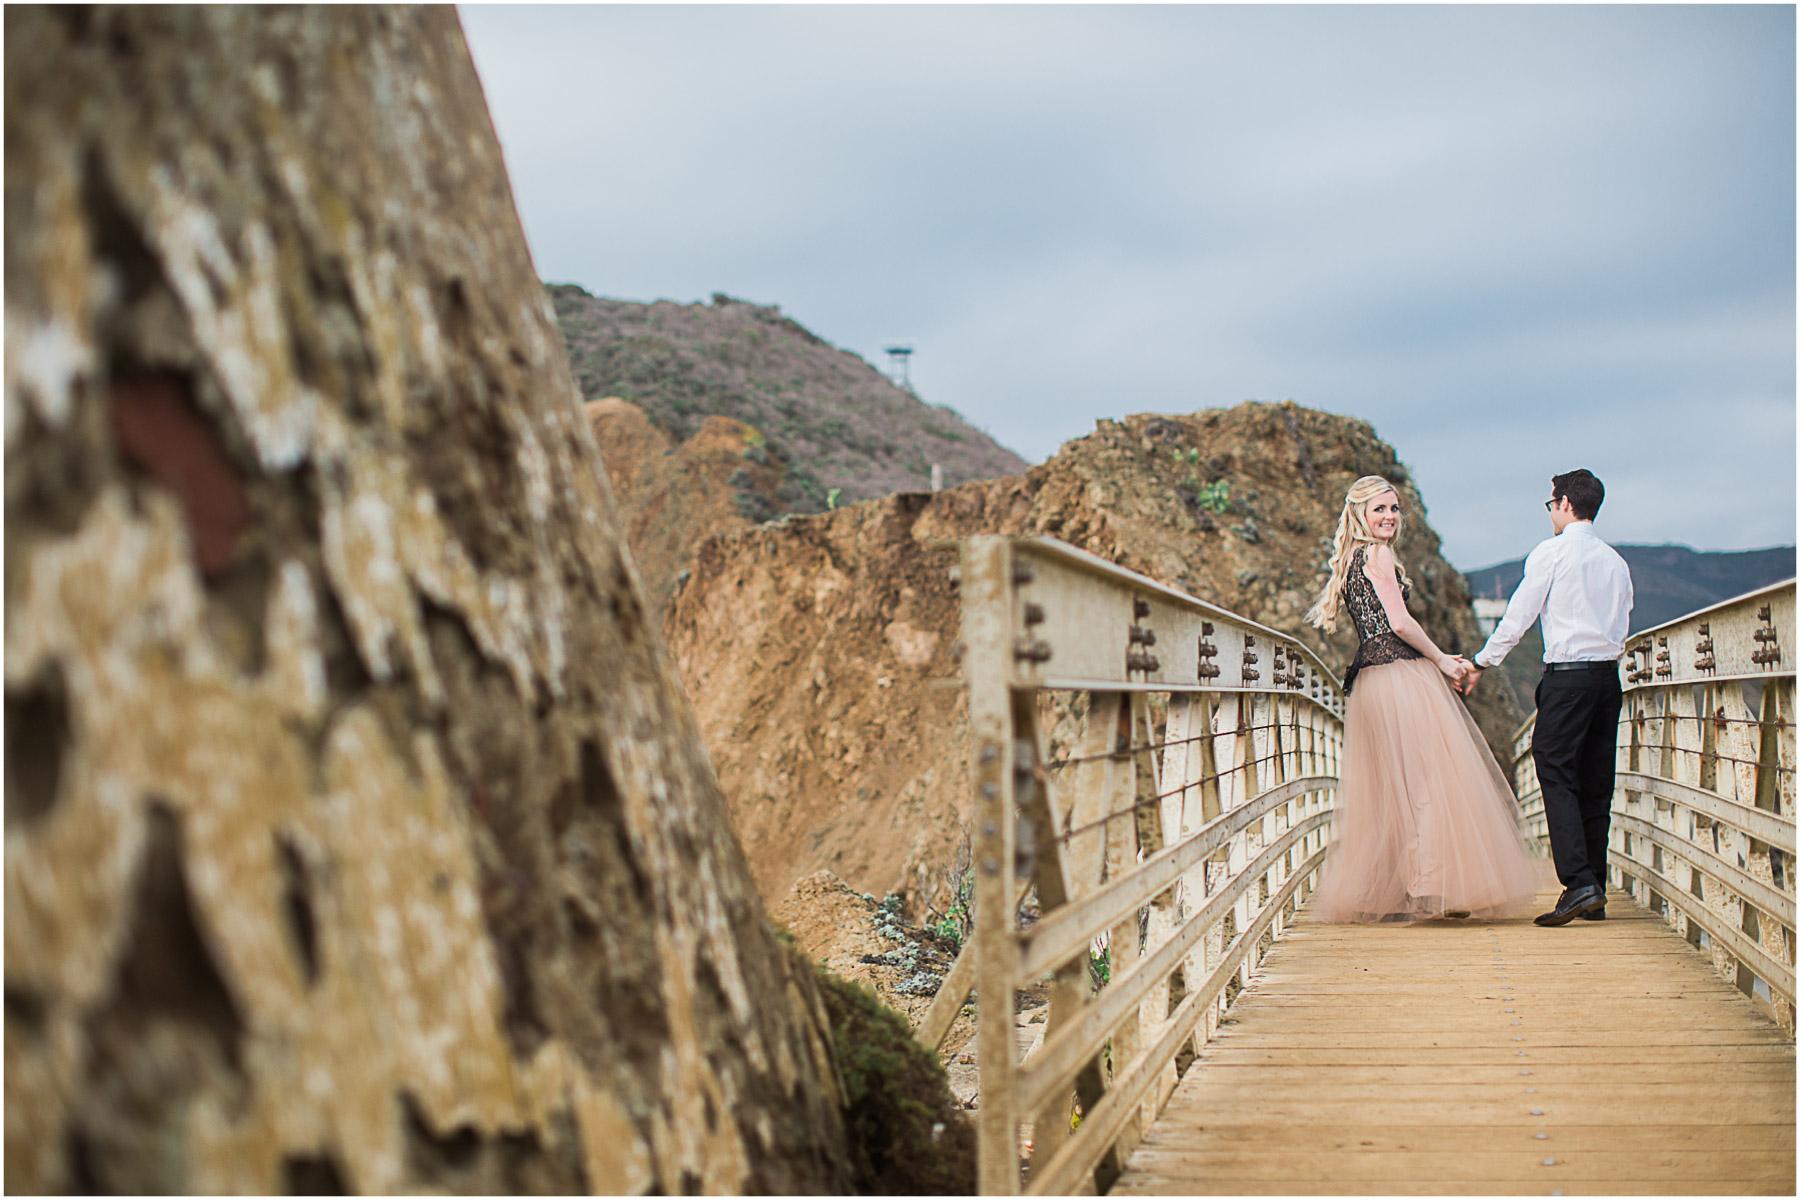 JennaBethPhotography-NTEngage-5.jpg